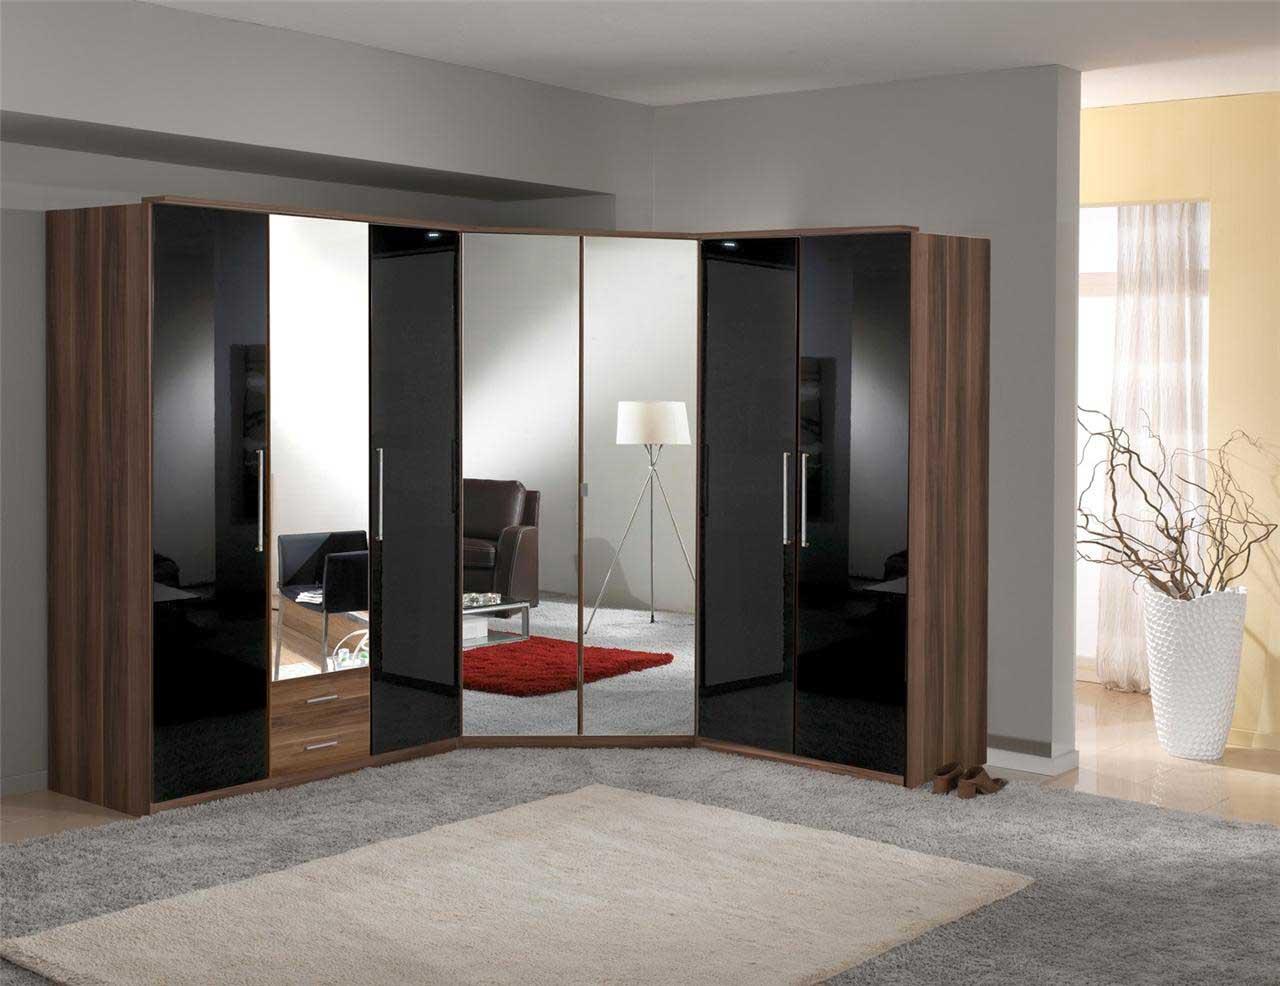 Распашной шкаф - классика мебельной моды